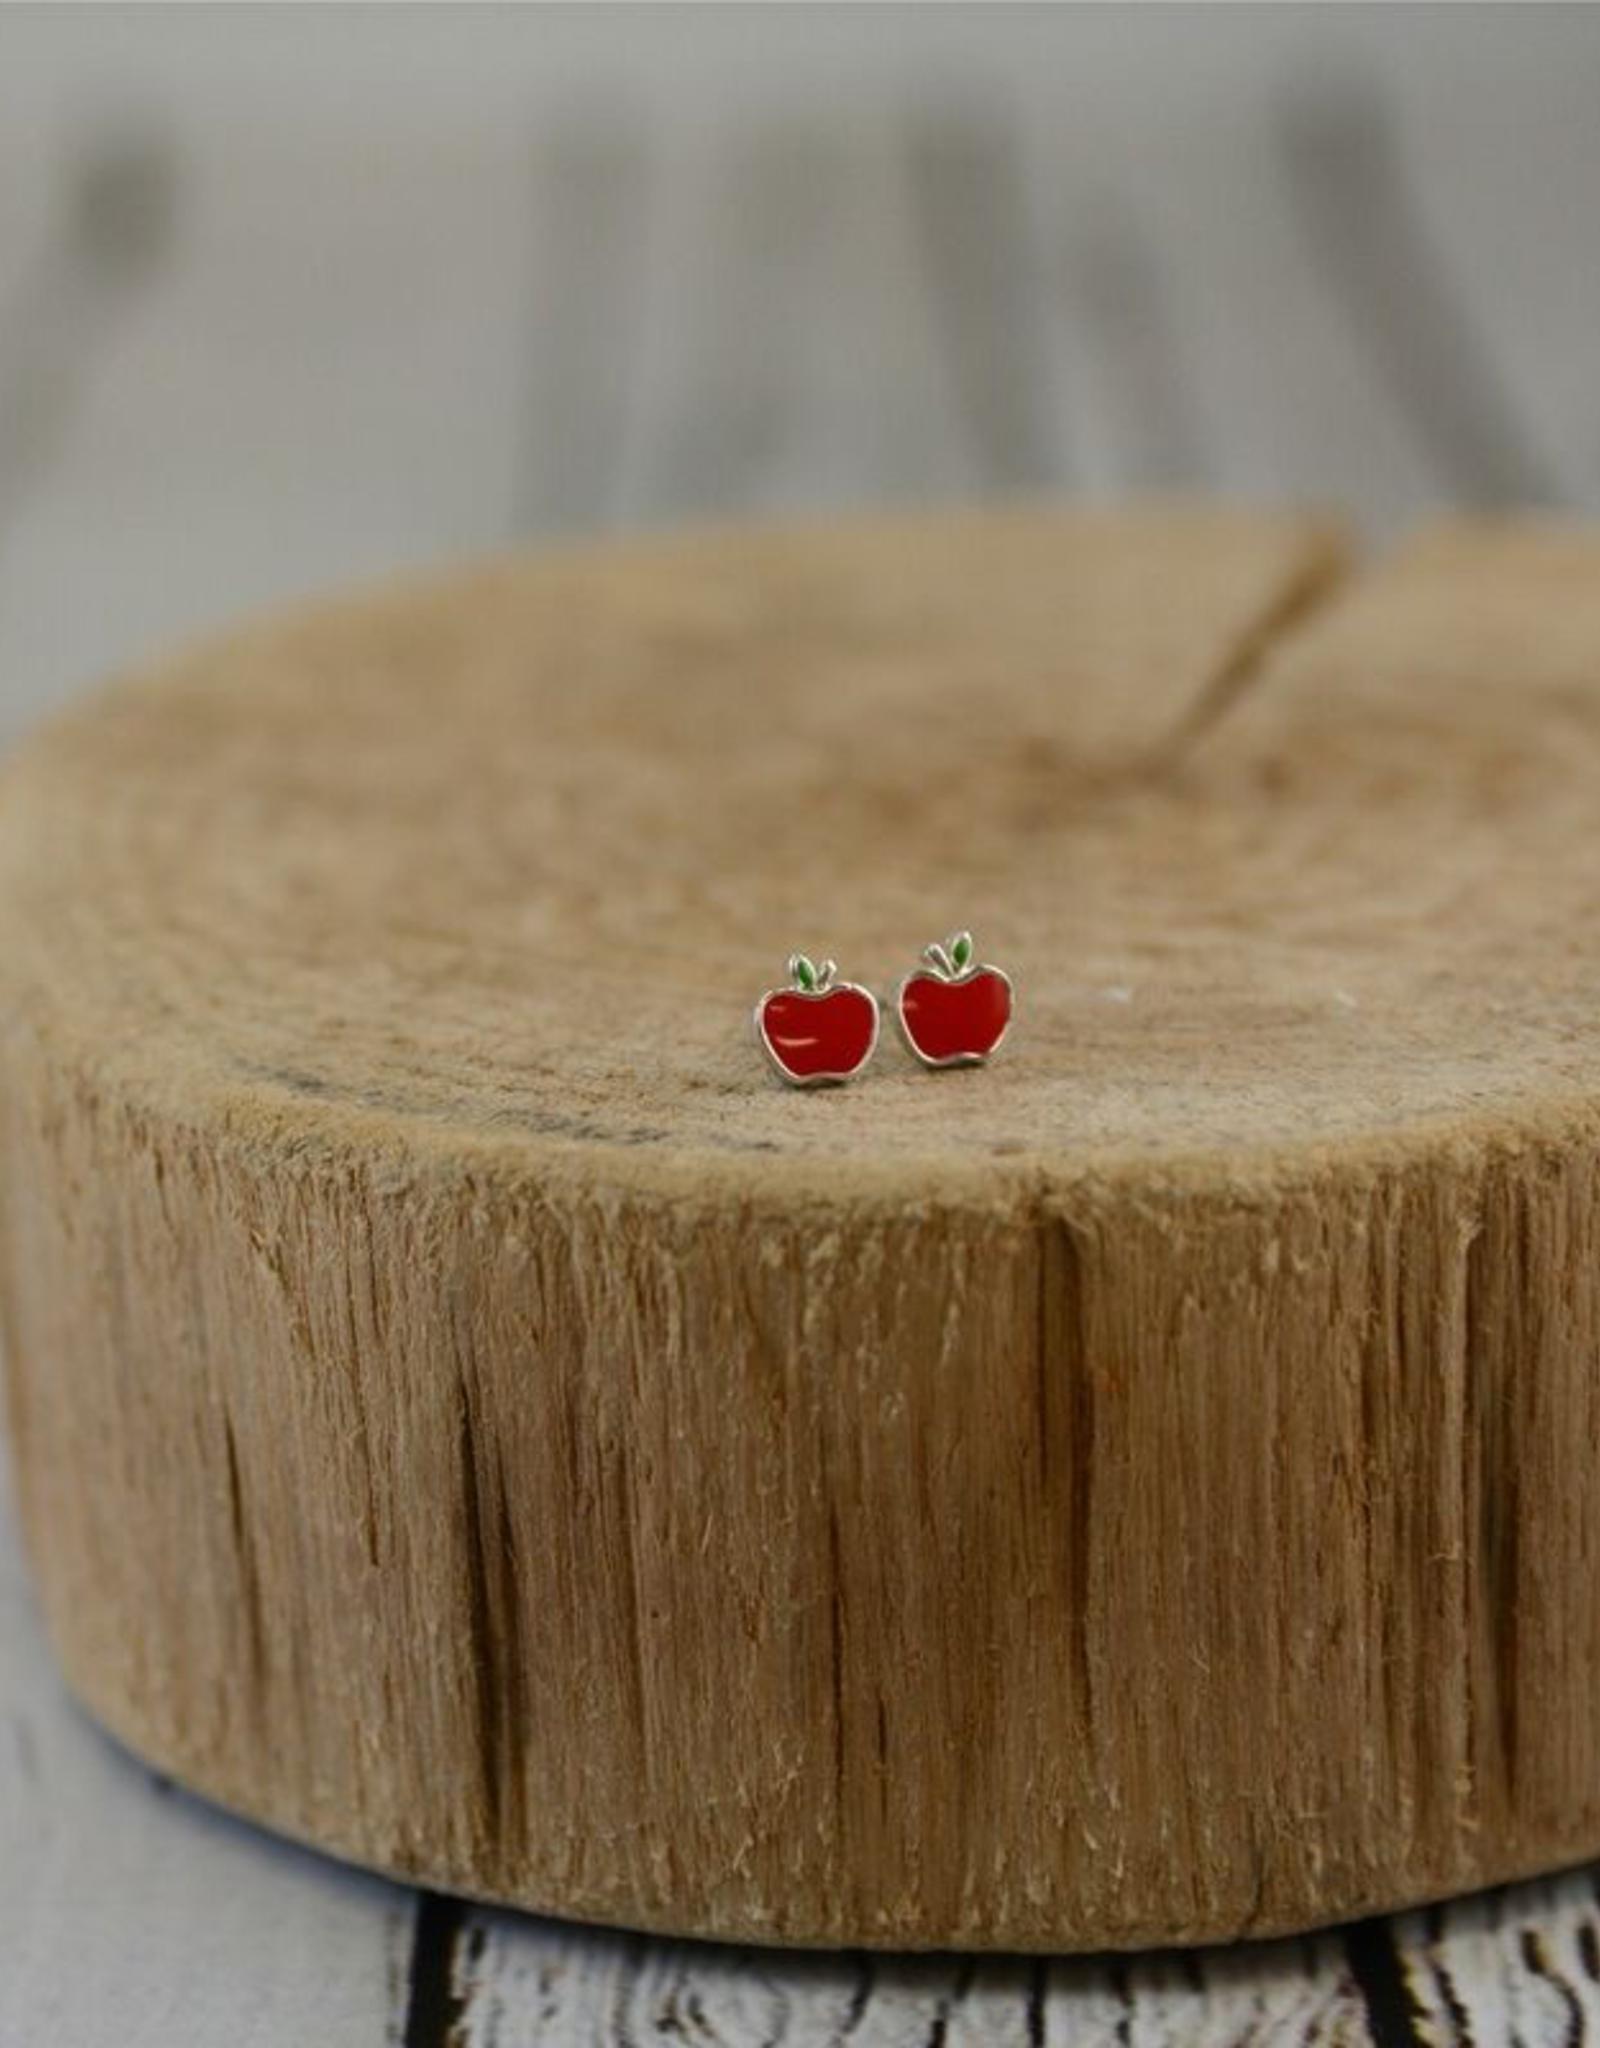 Sterling Silver and Red Enamel Apple Stud Earrings